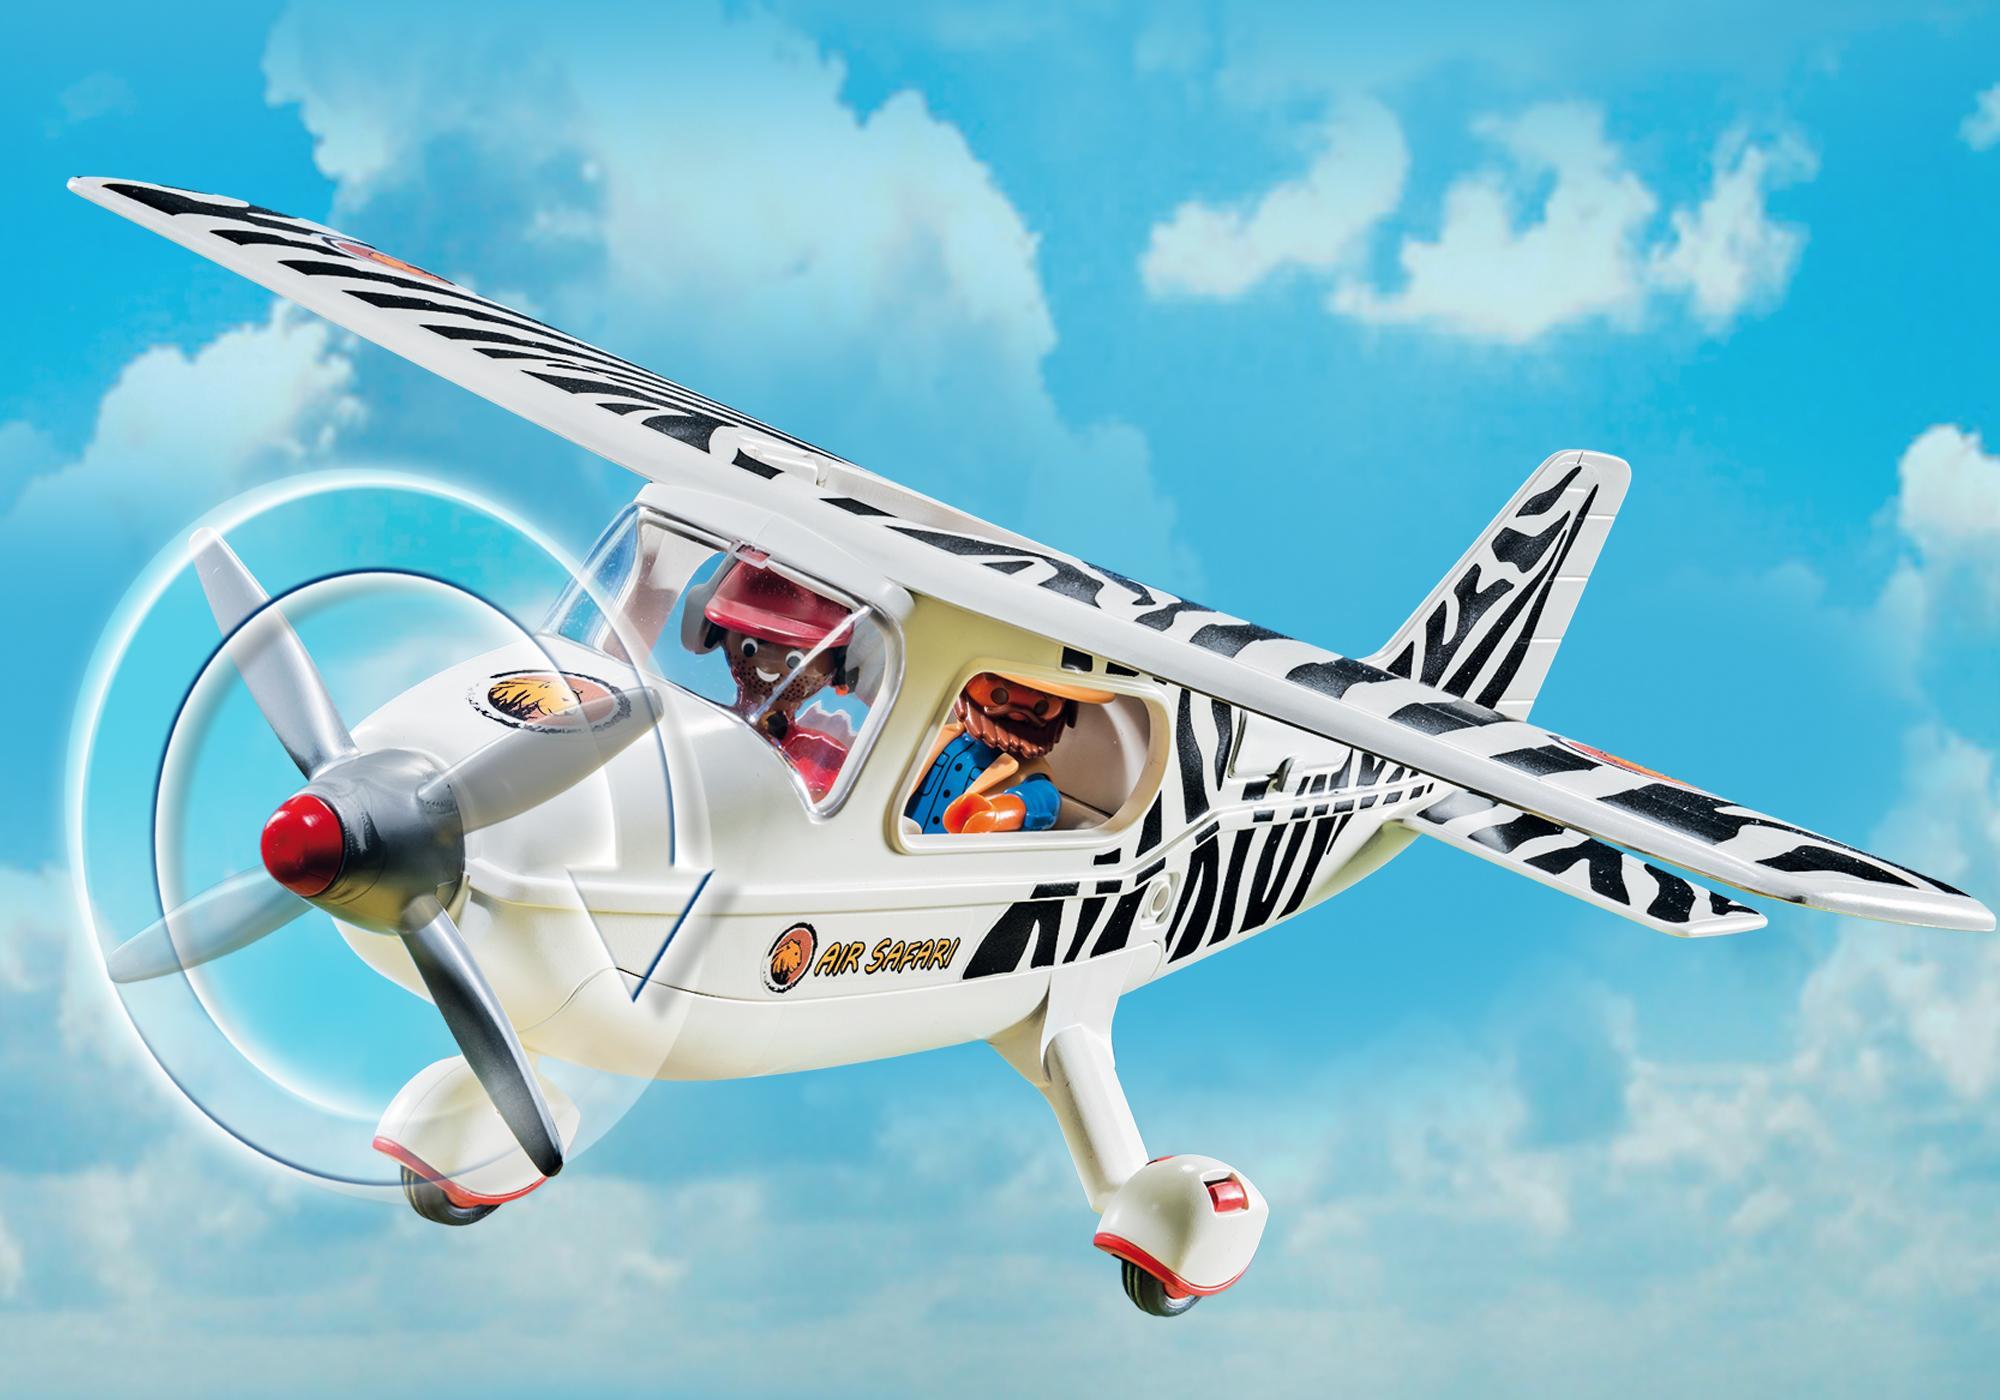 http://media.playmobil.com/i/playmobil/6938_product_extra2/Samolot safari